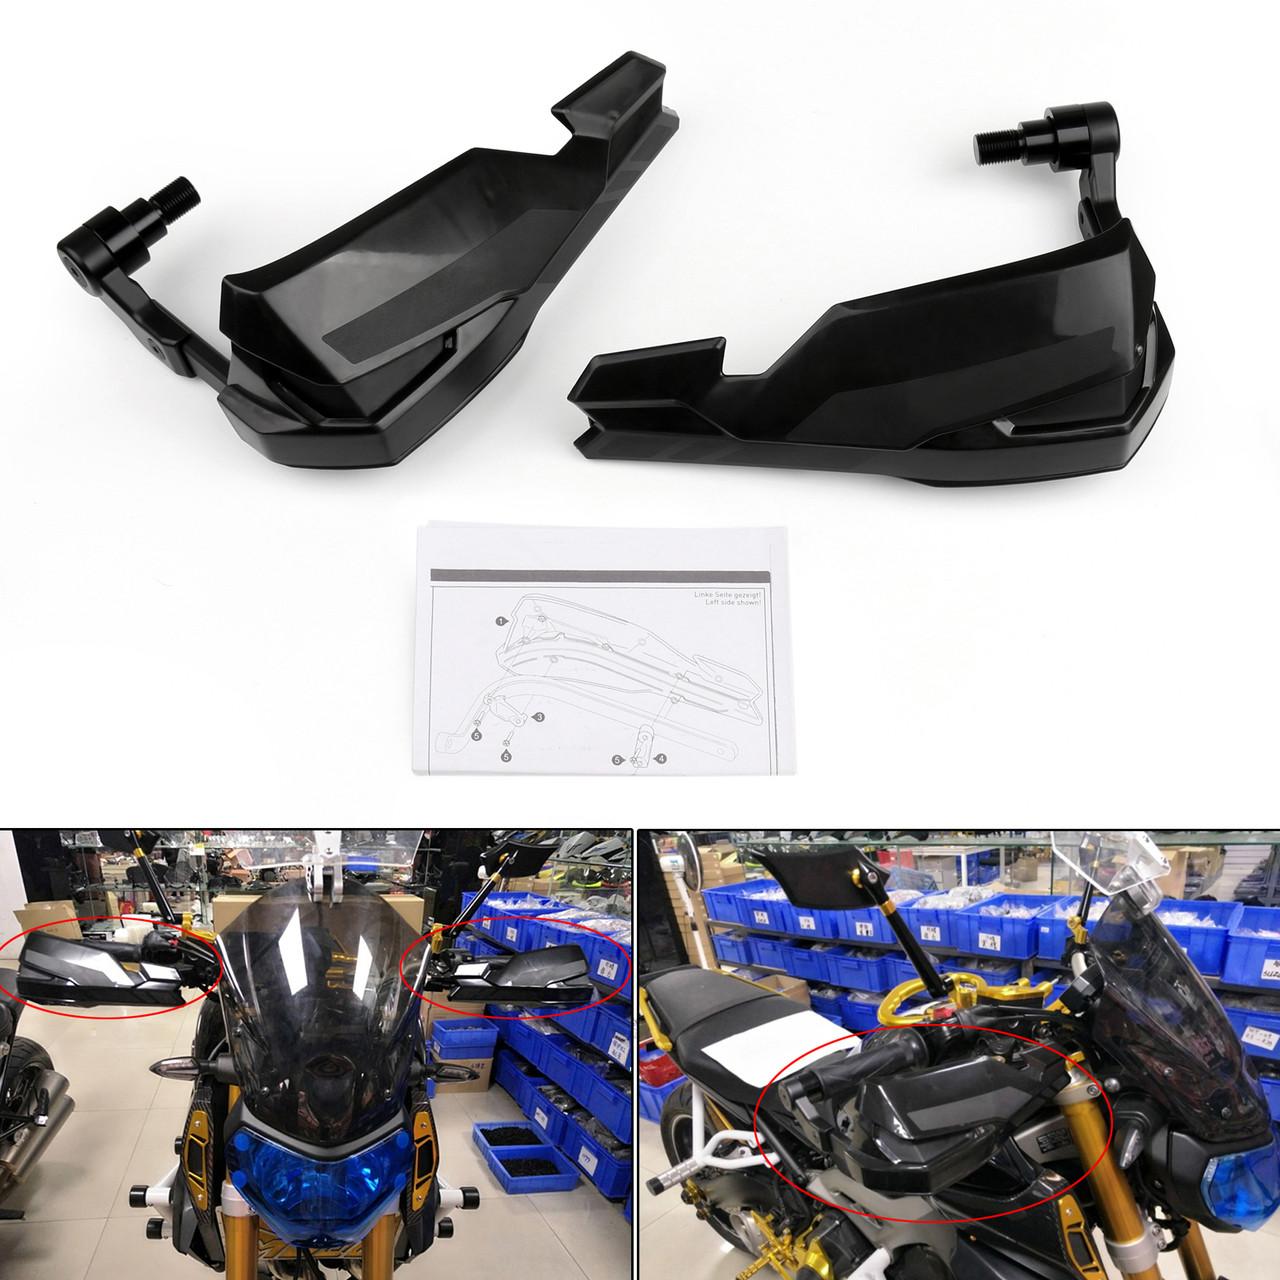 Pro Guard Brush Bar Hand Lever Protection Kit For Yamaha MT-07 MT-09  XT1200Z/X XJR1300 XSR700 MT125 Black